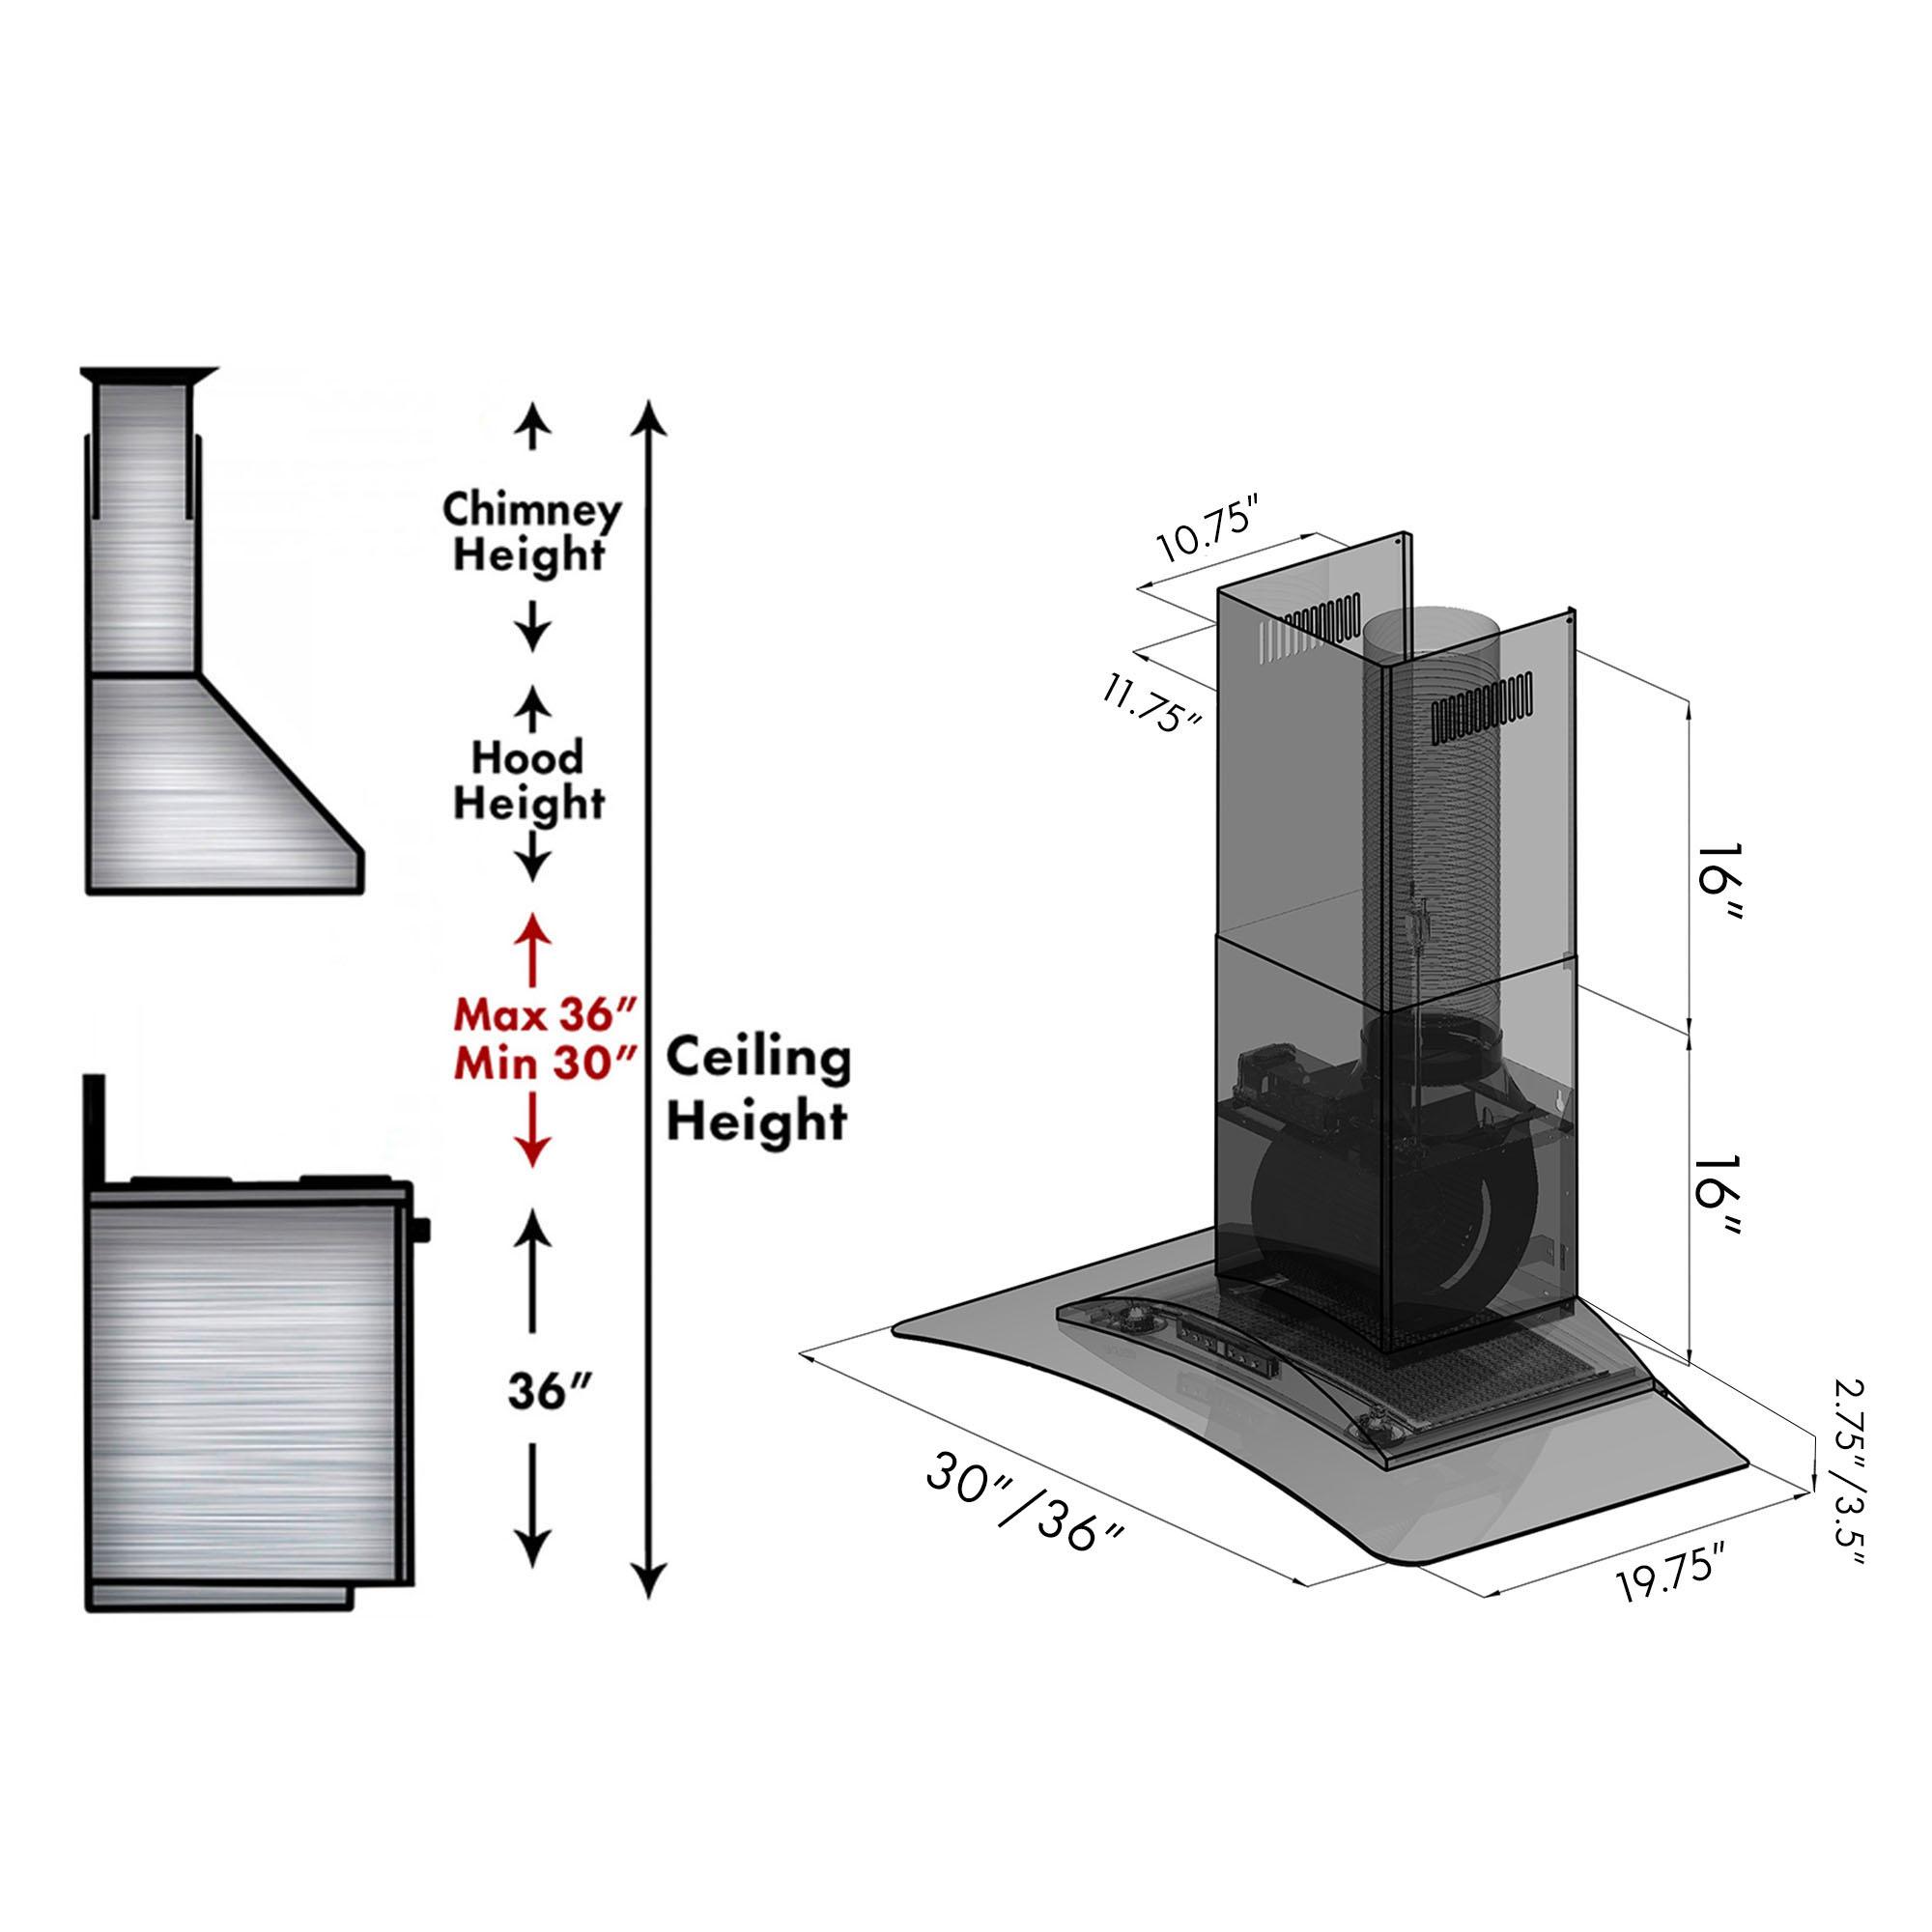 zline-stainless-steel-wall-mount-kz-graphic-ZLK.jpg